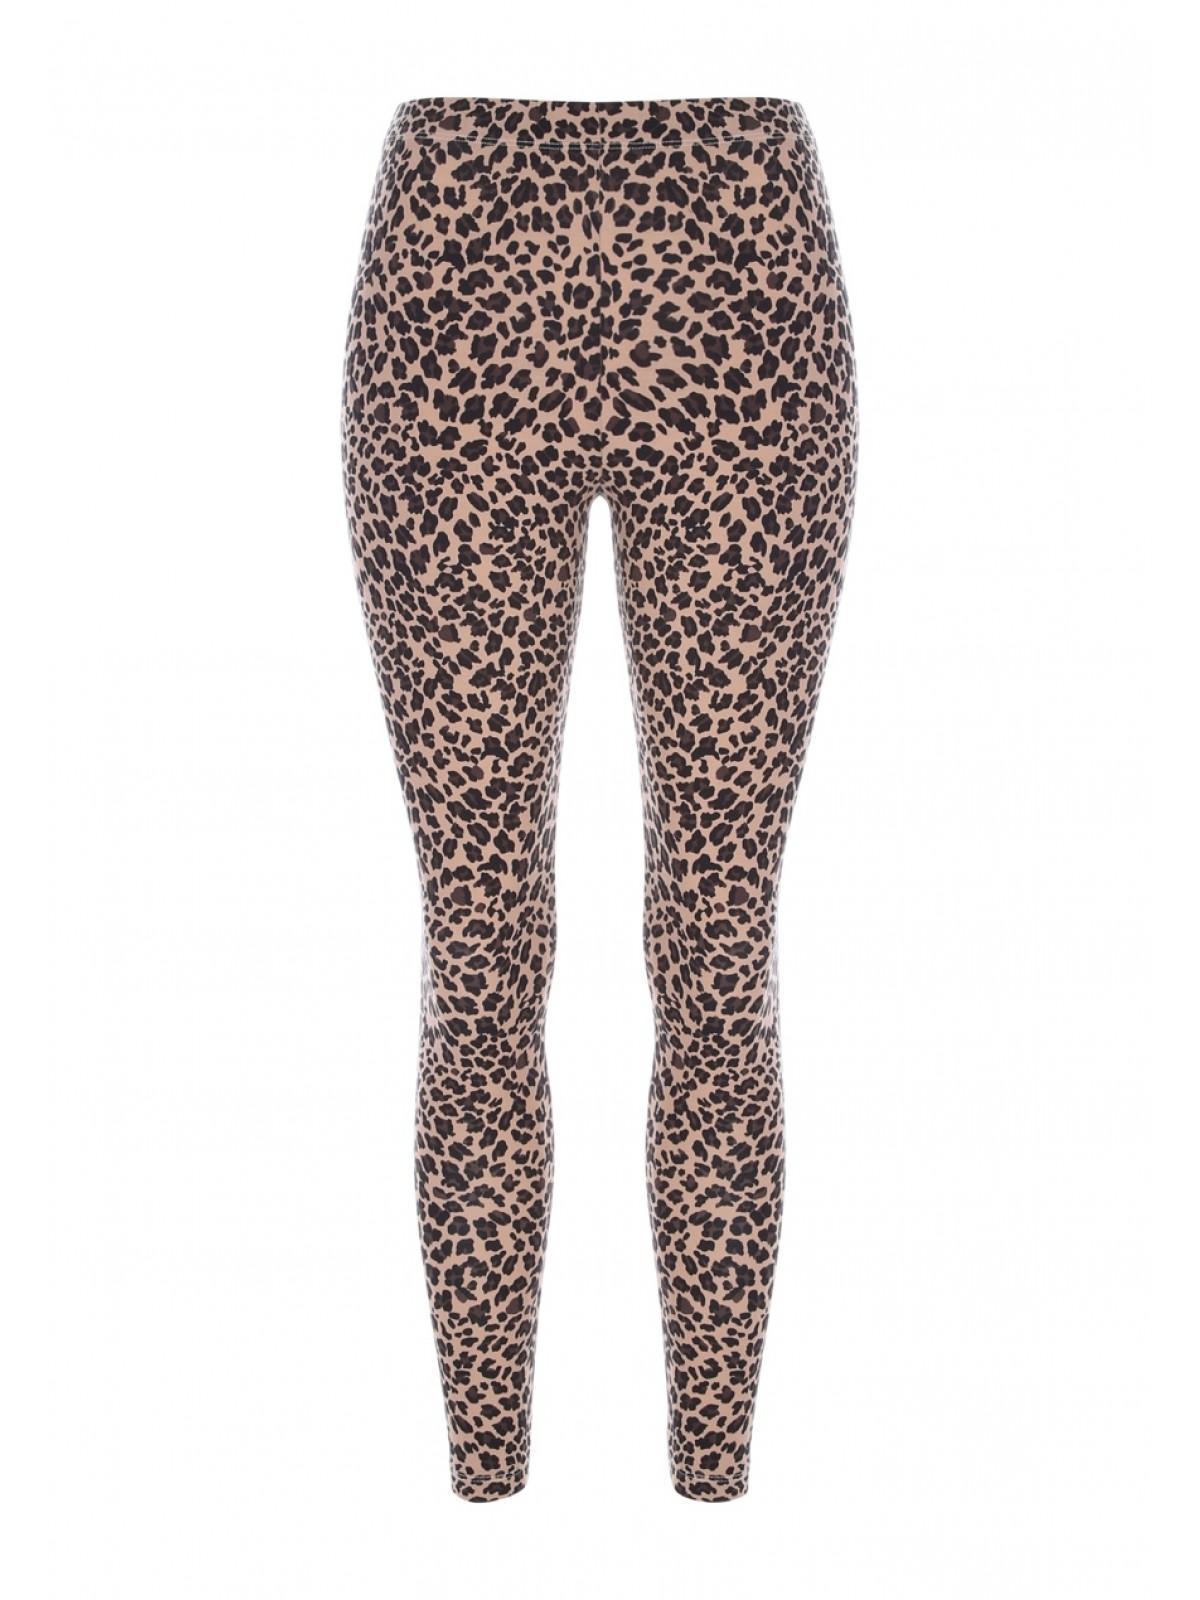 0b815830e9402 Home; Womens Leopard Print Leggings. Back. PreviousNext